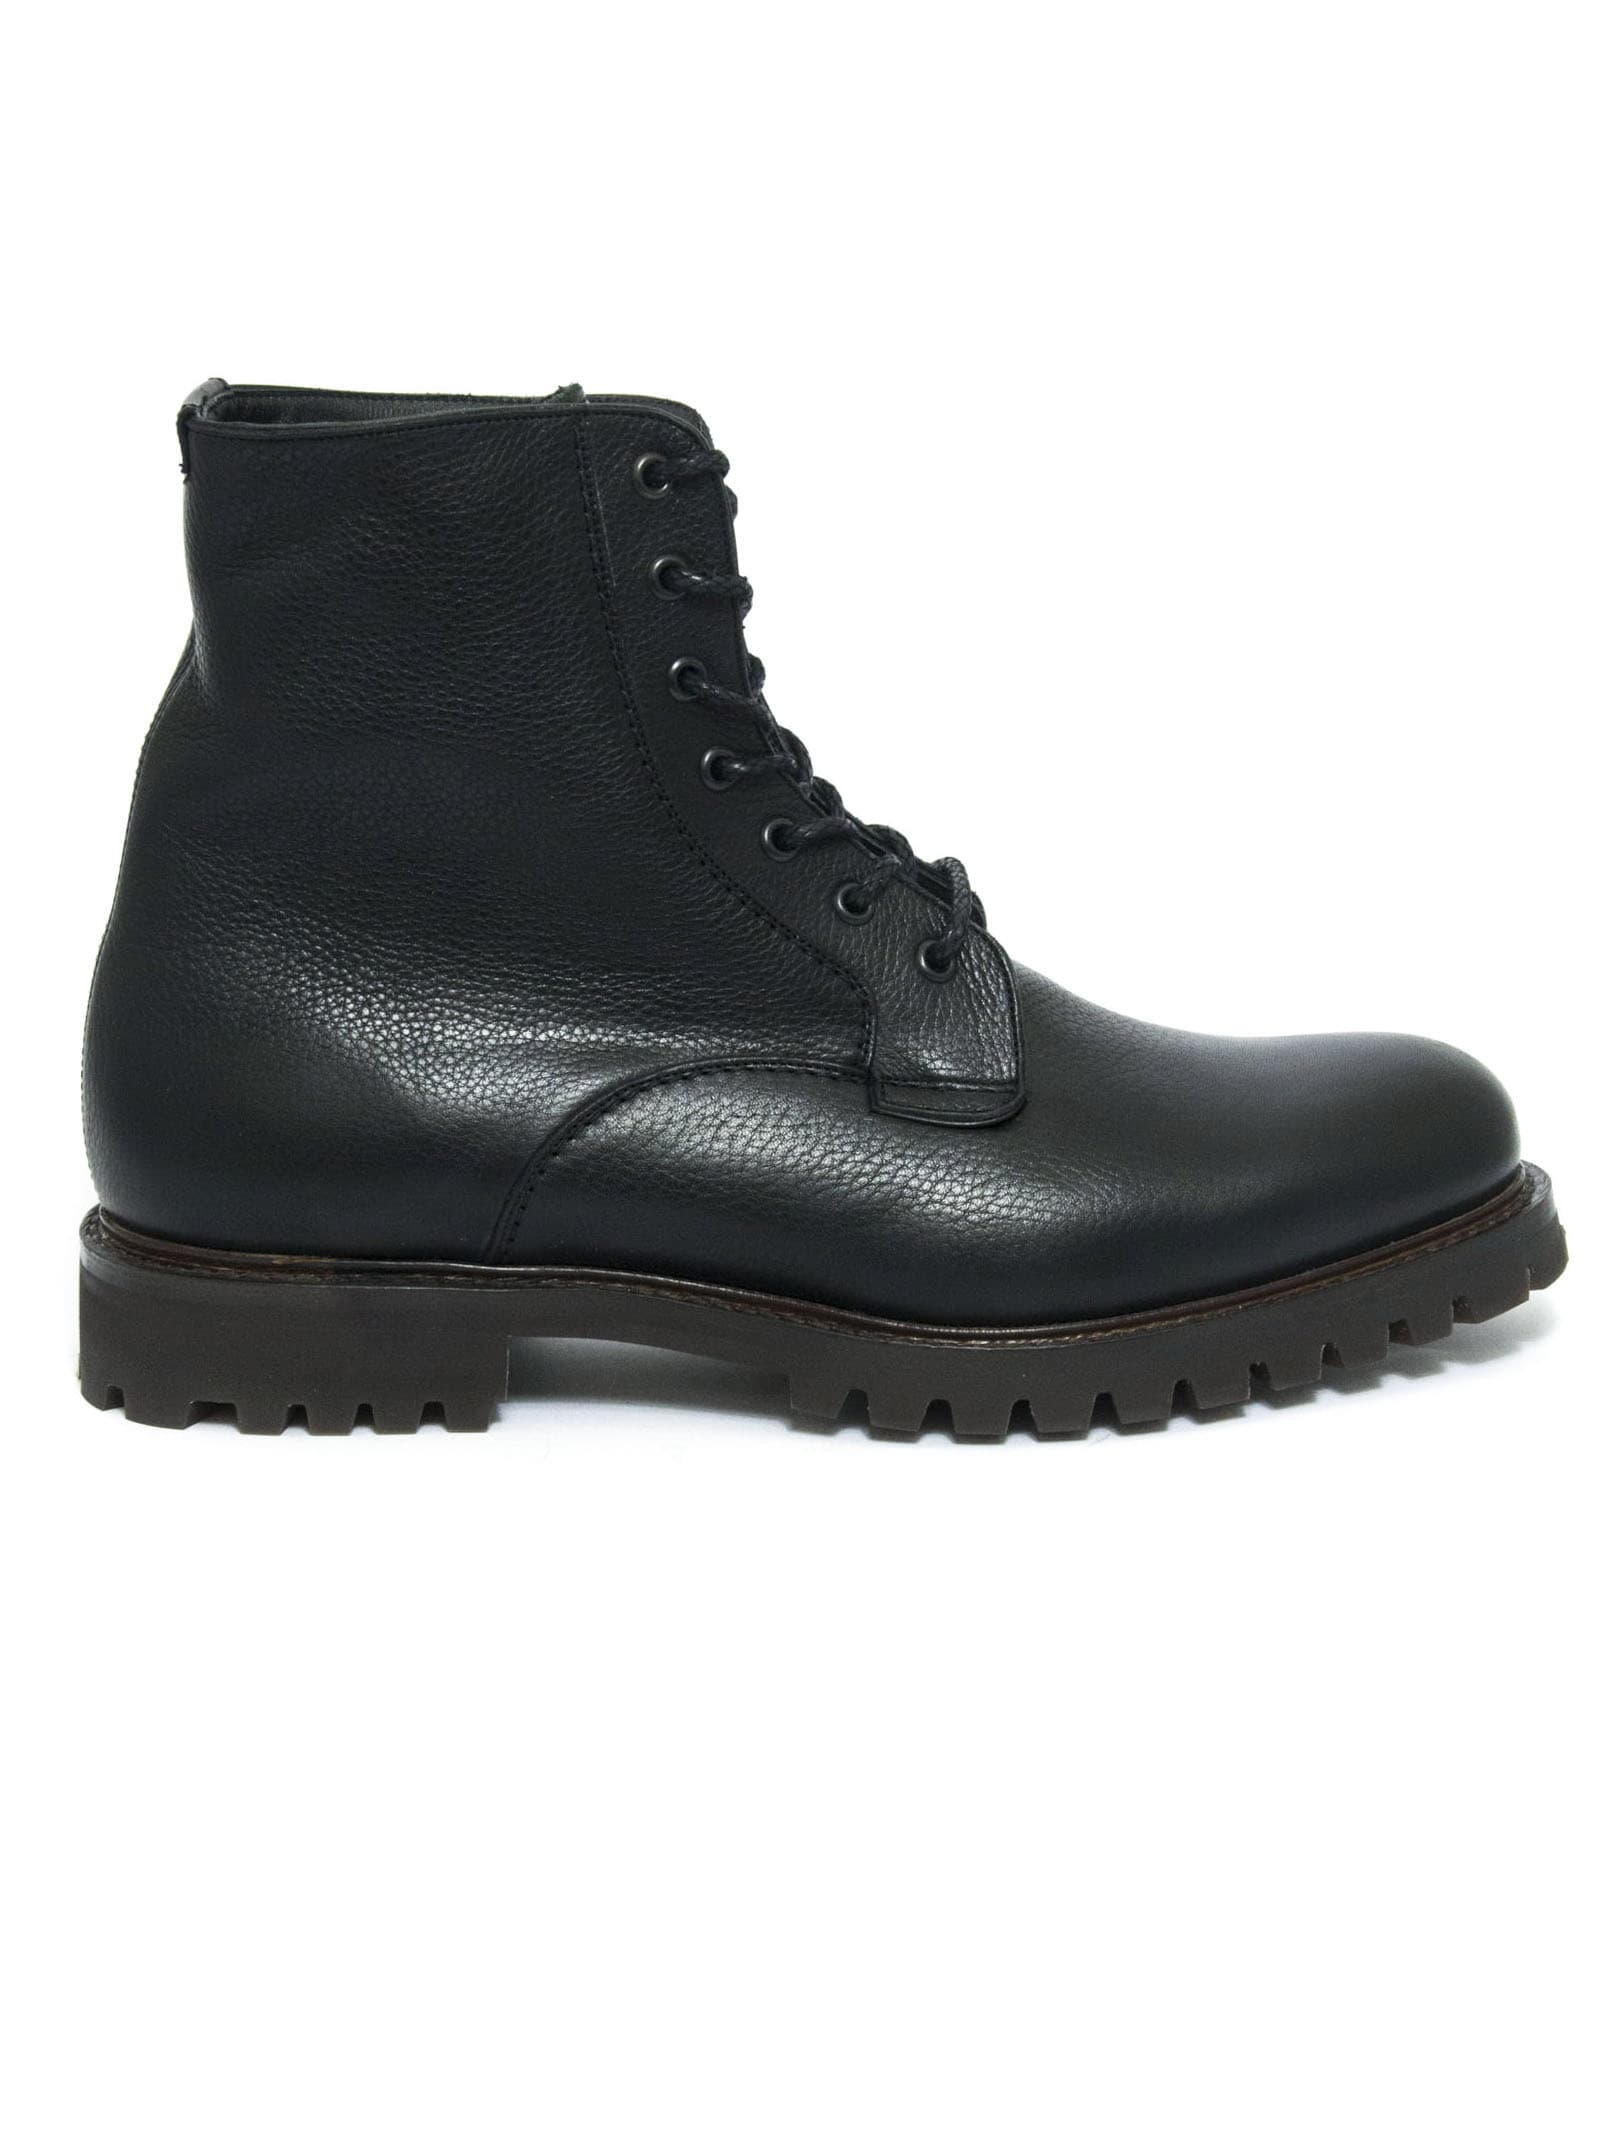 Churchs Coalport Soft Grain & Fur Lace-up Boot Black